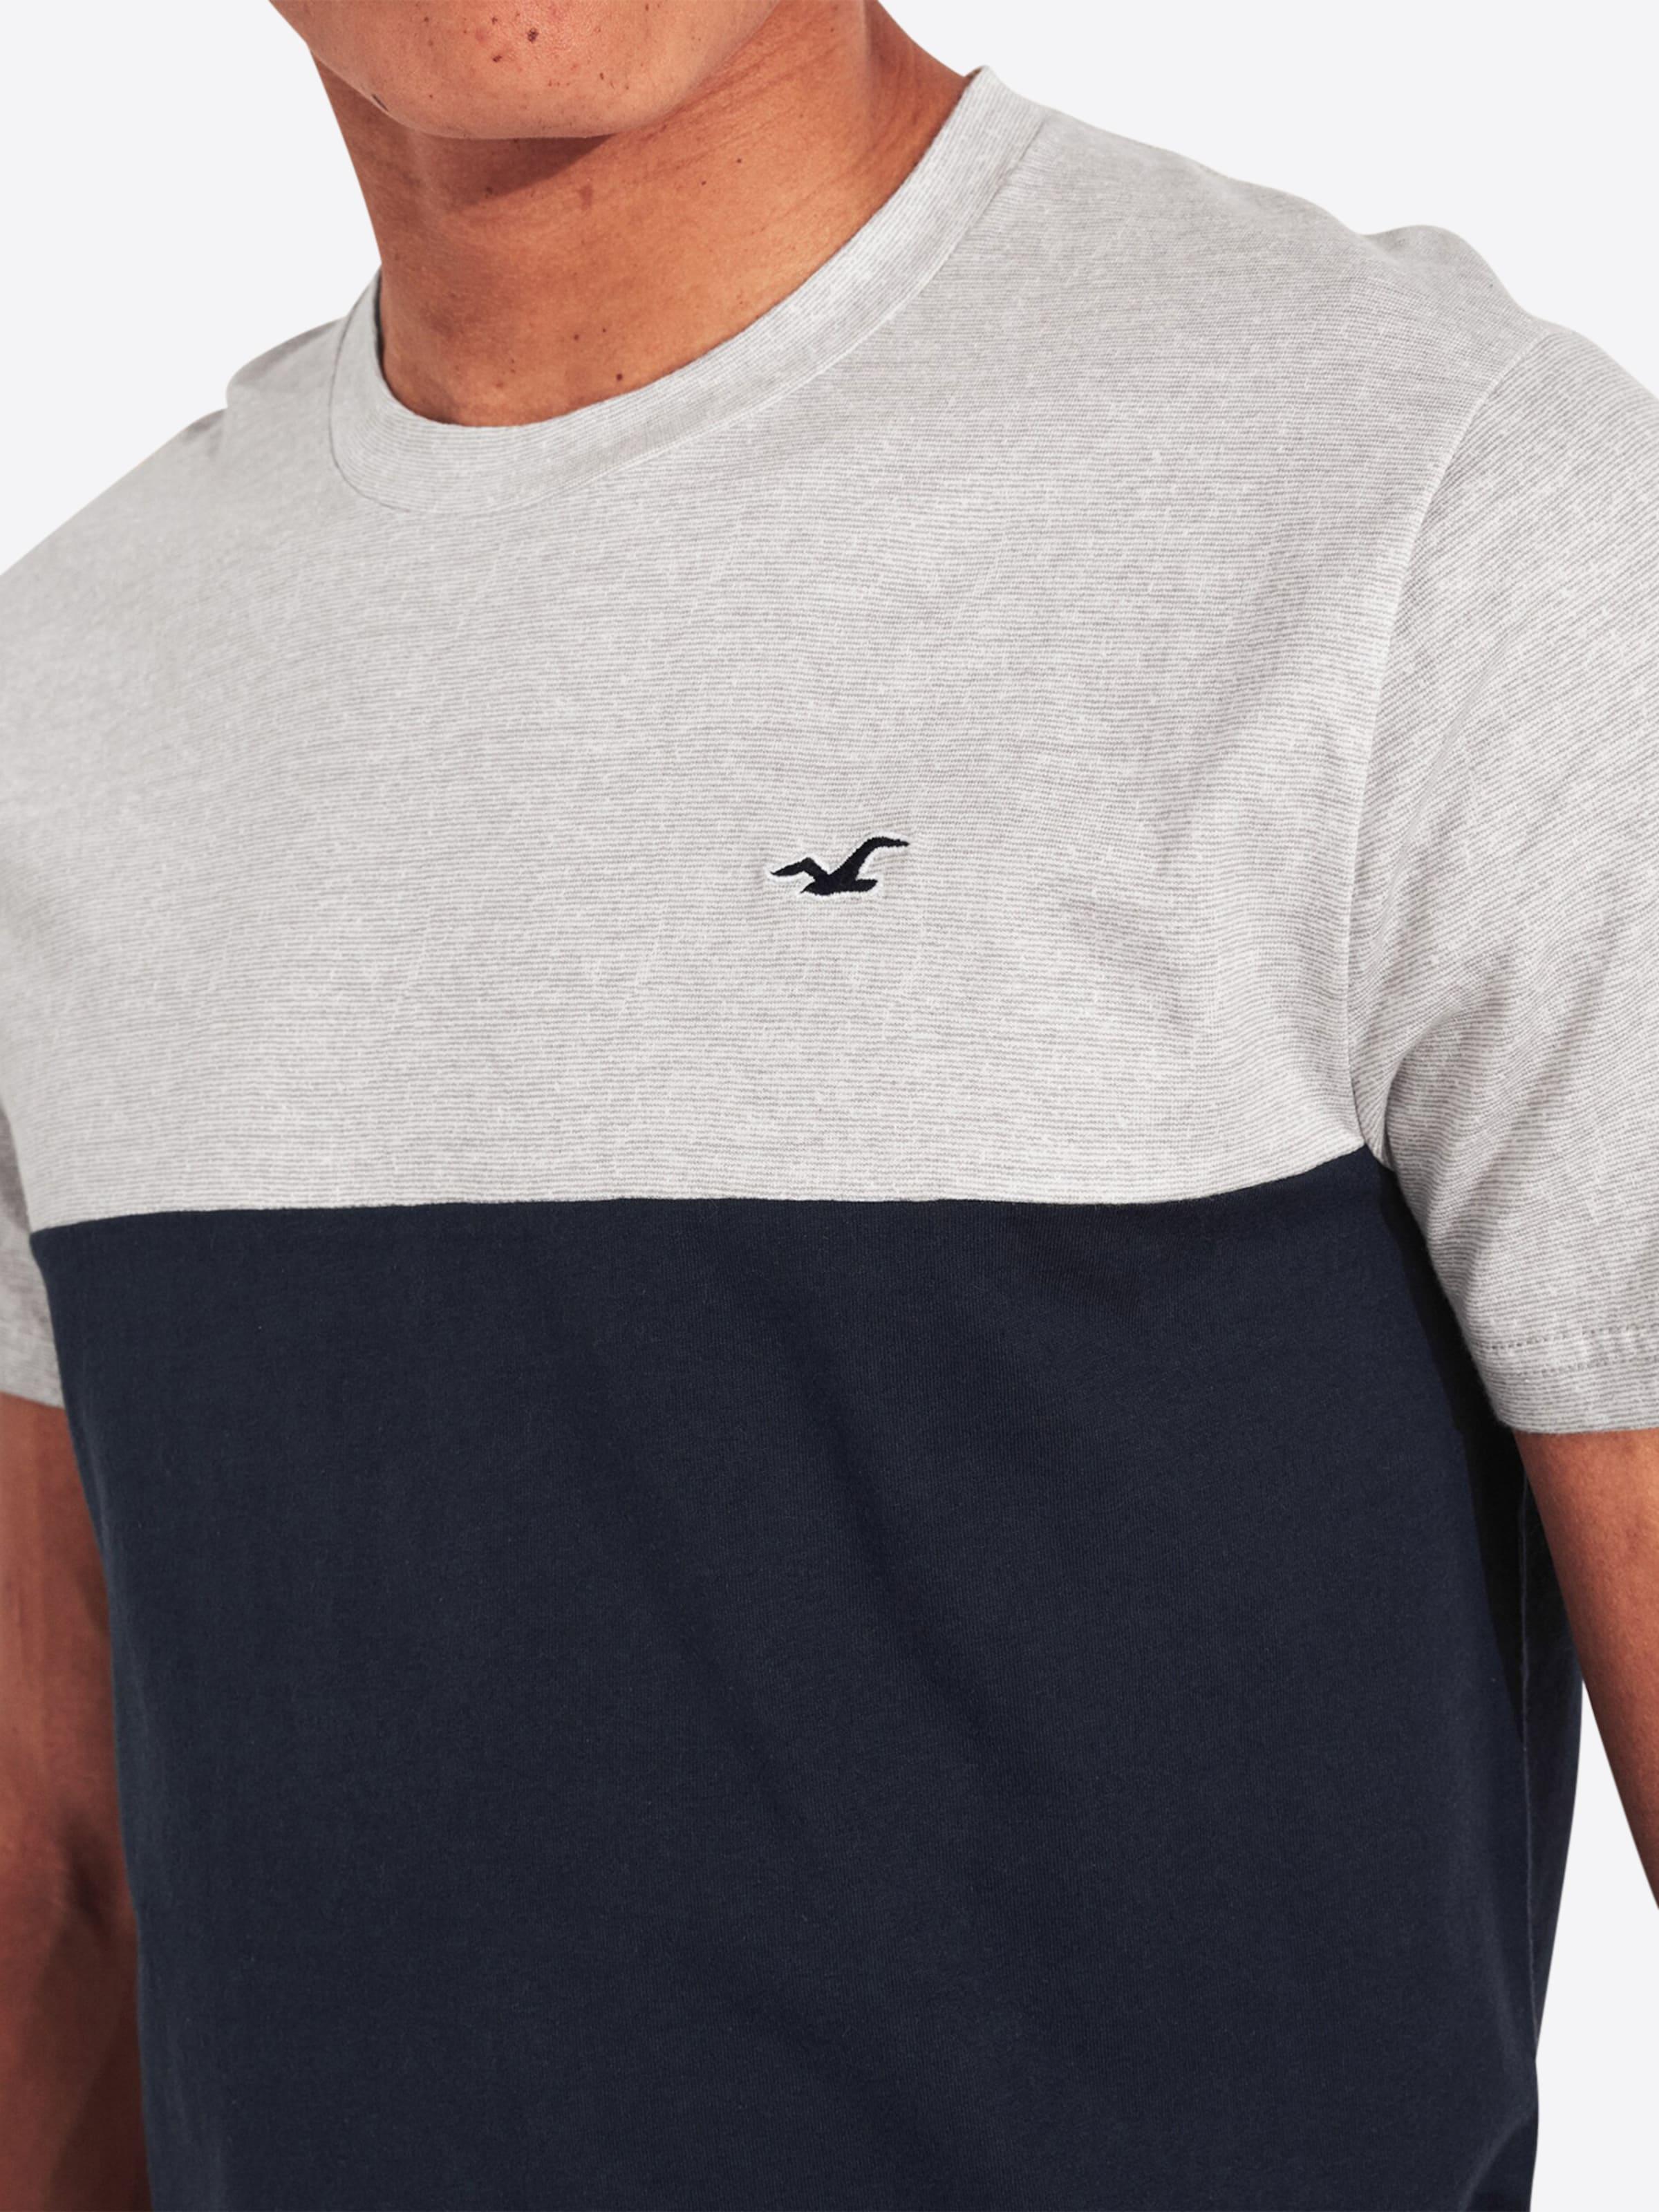 In Hollister Shirt In Shirt Grau In Hollister Shirt Shirt Hollister Grau Grau Hollister bf6yI7gvYm